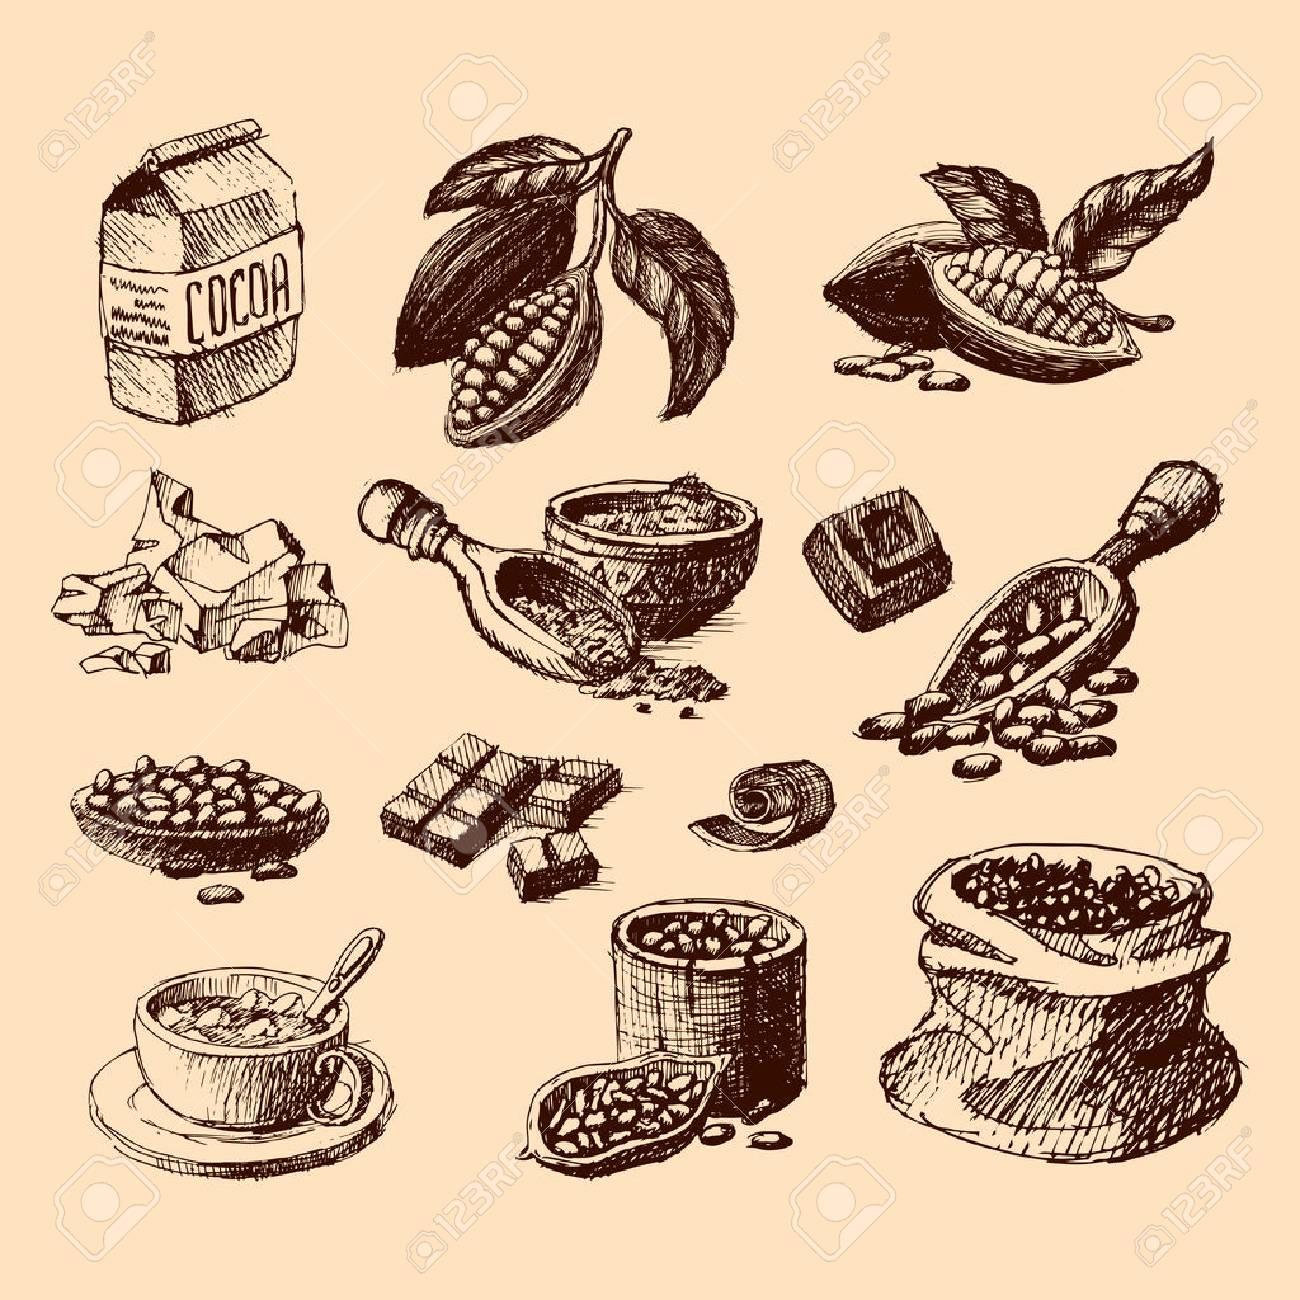 Vector cocoa hand drawn sketch illustration. - 70981822